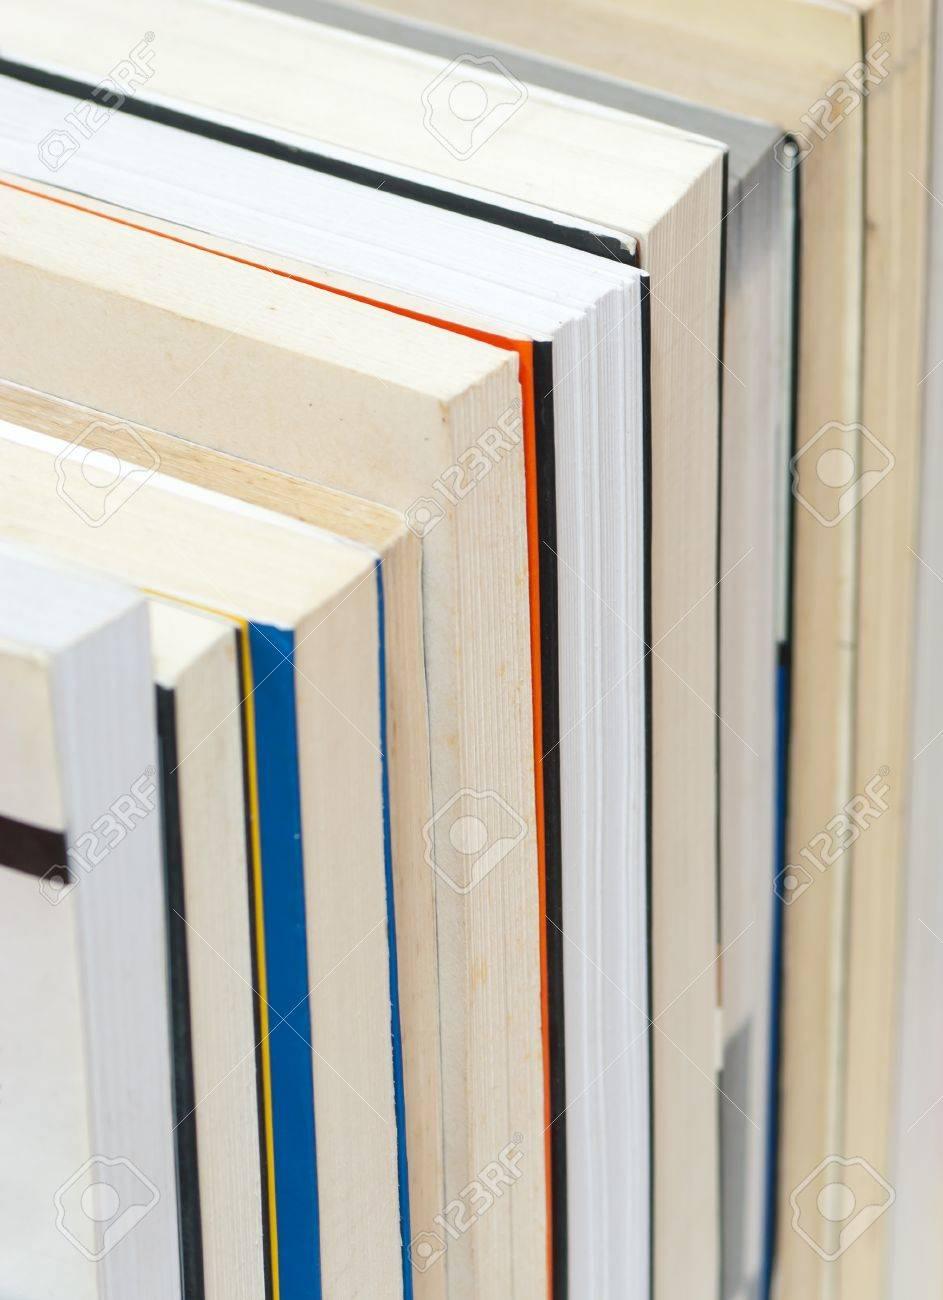 book Stock Photo - 12329700